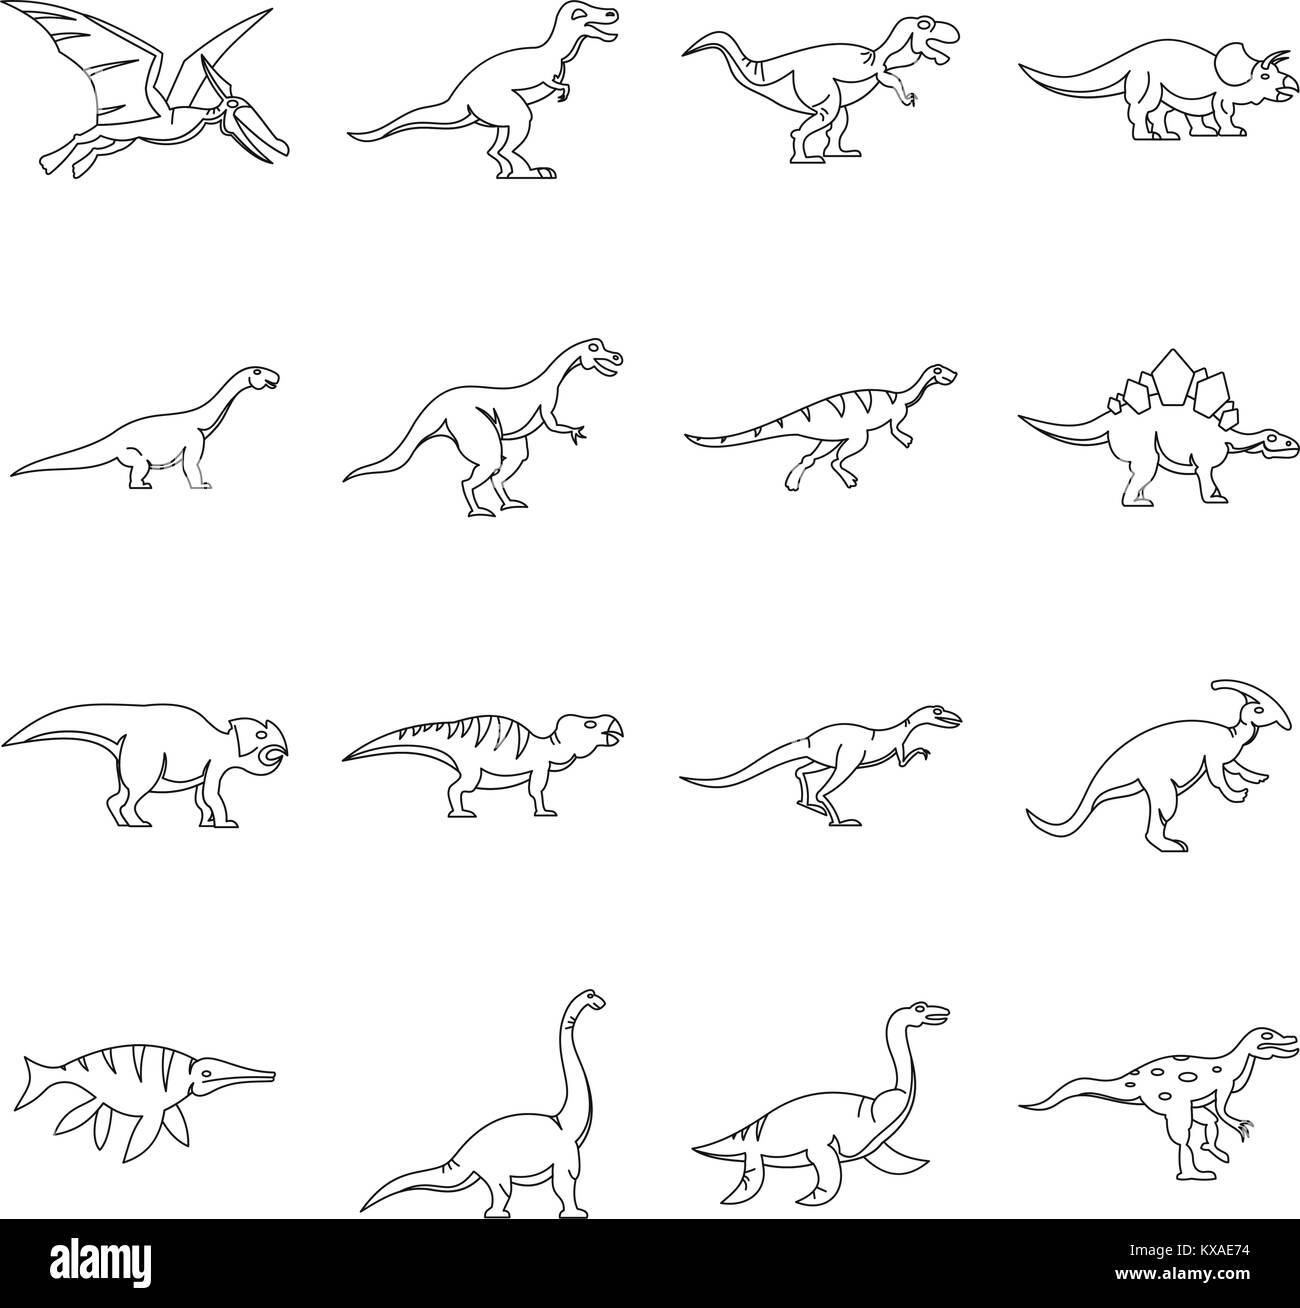 Dinosaur icons set, outline style - Stock Image